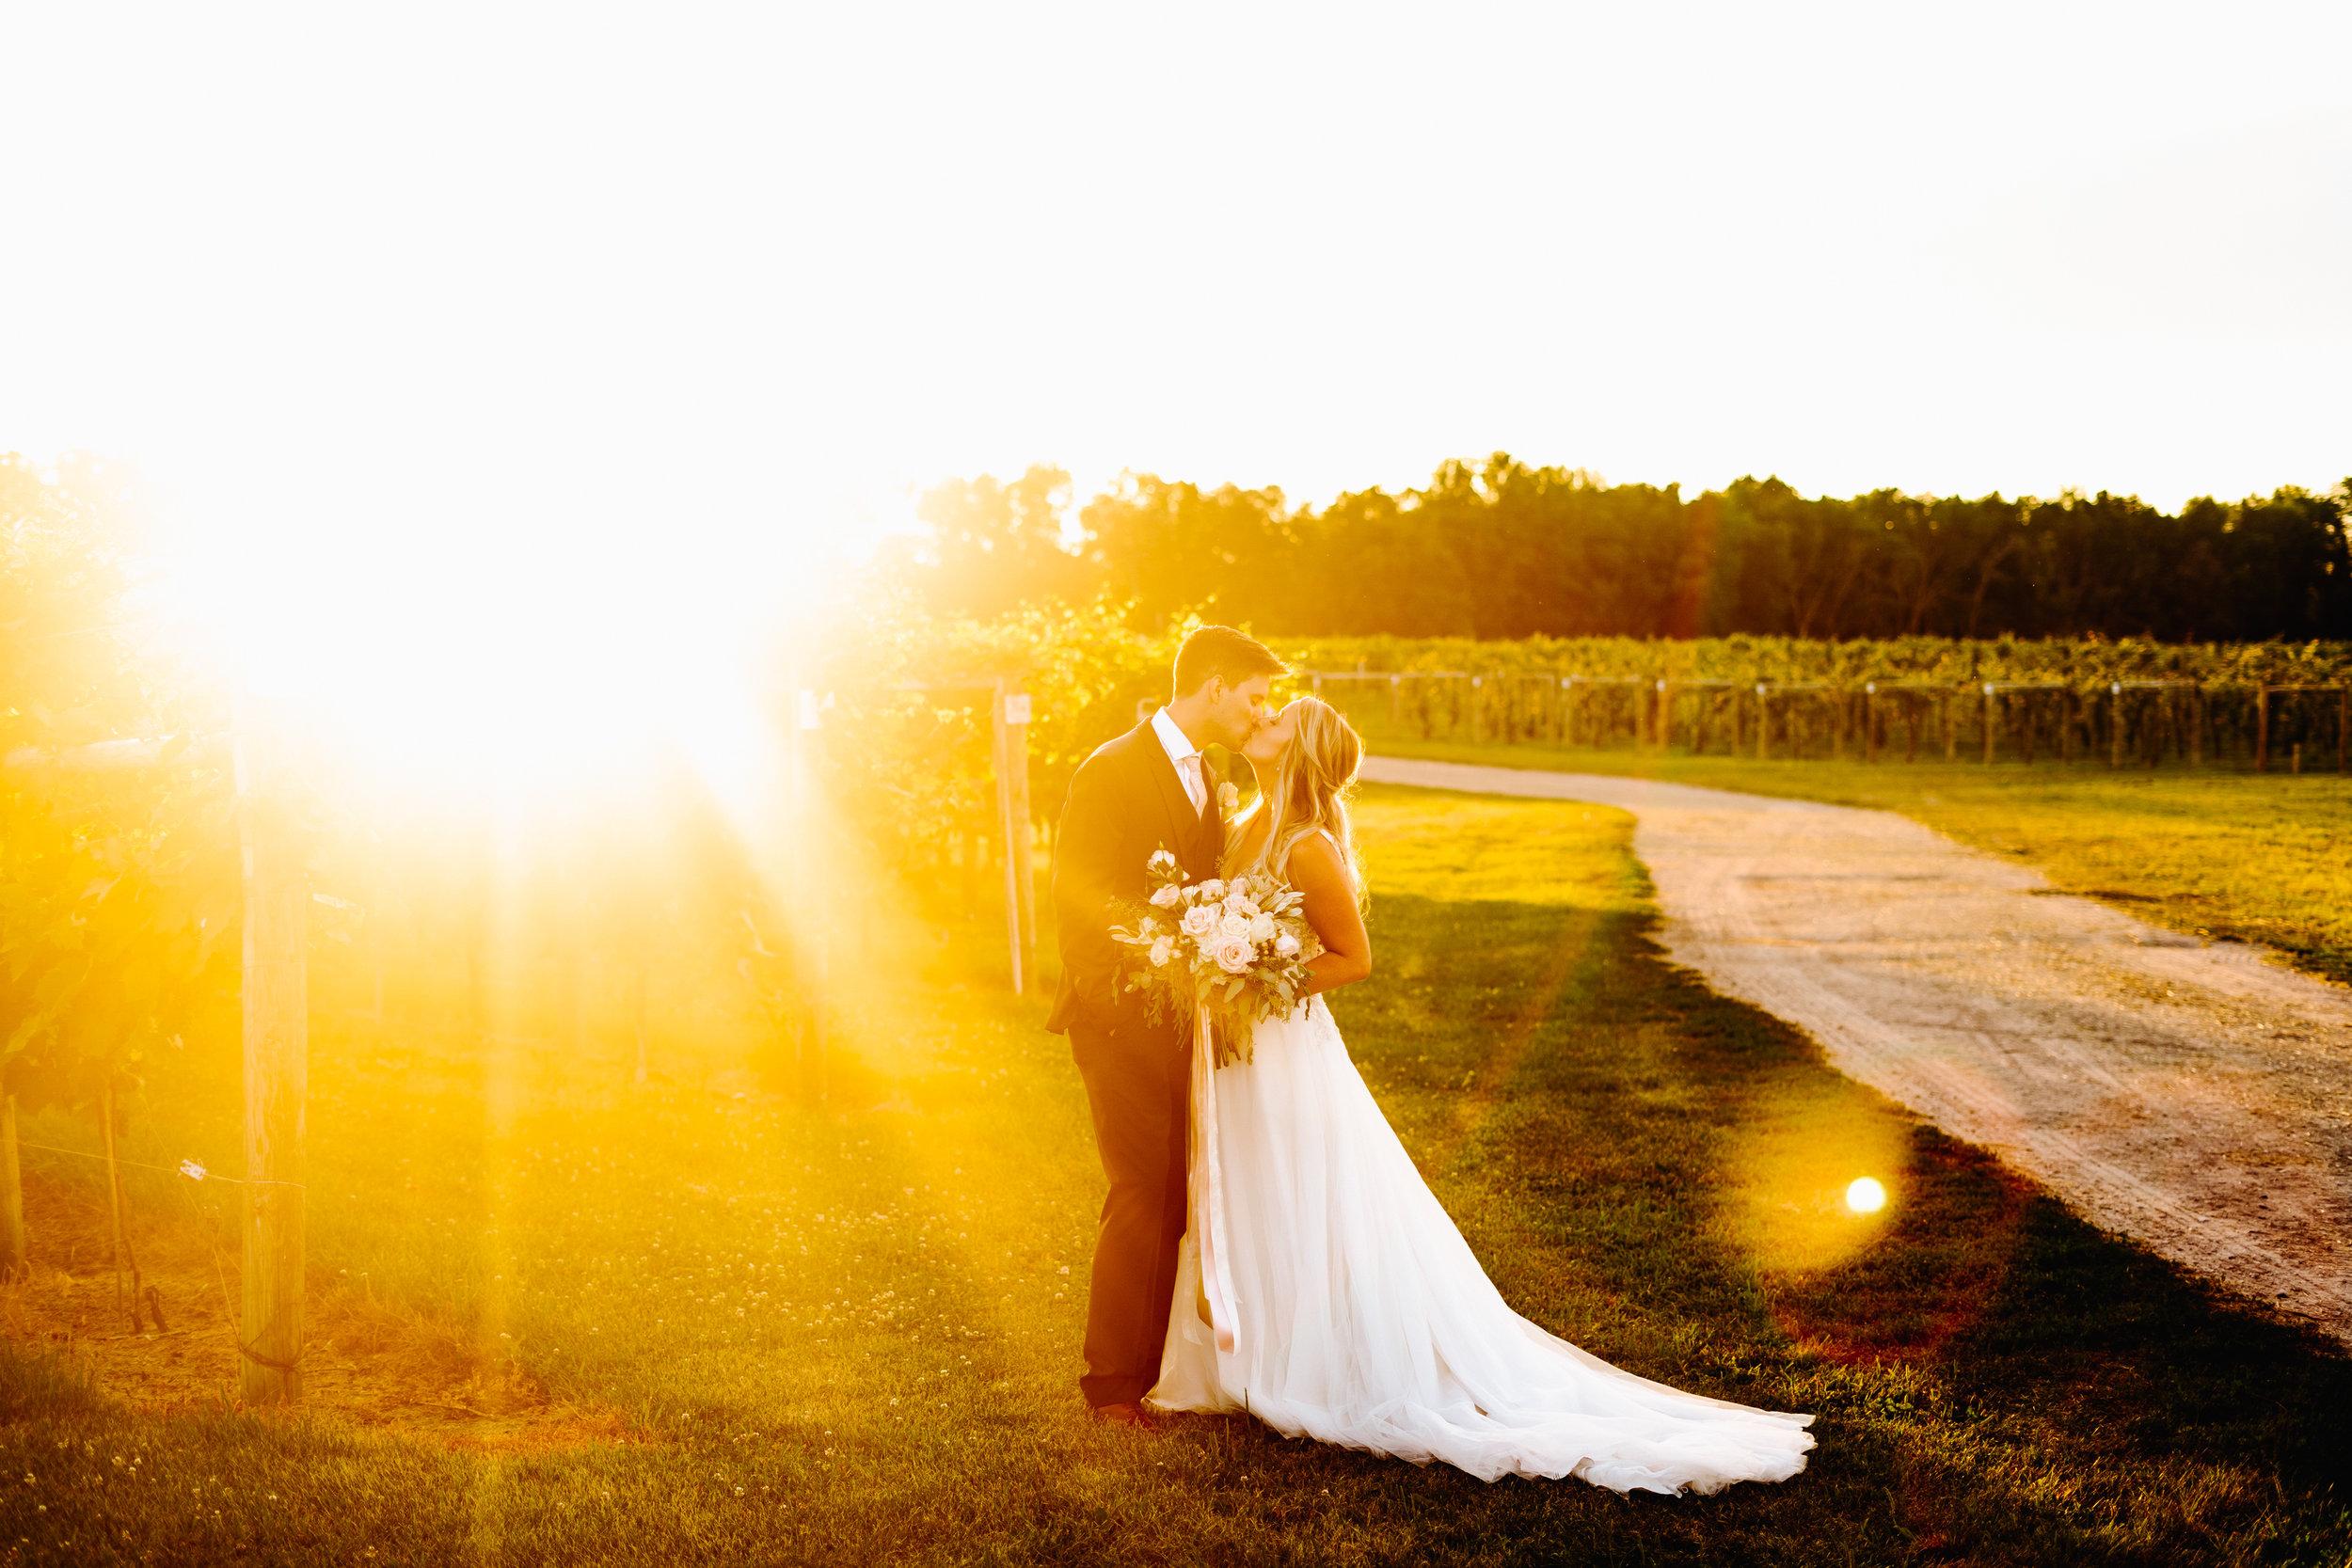 davies-wedding-05370.jpg